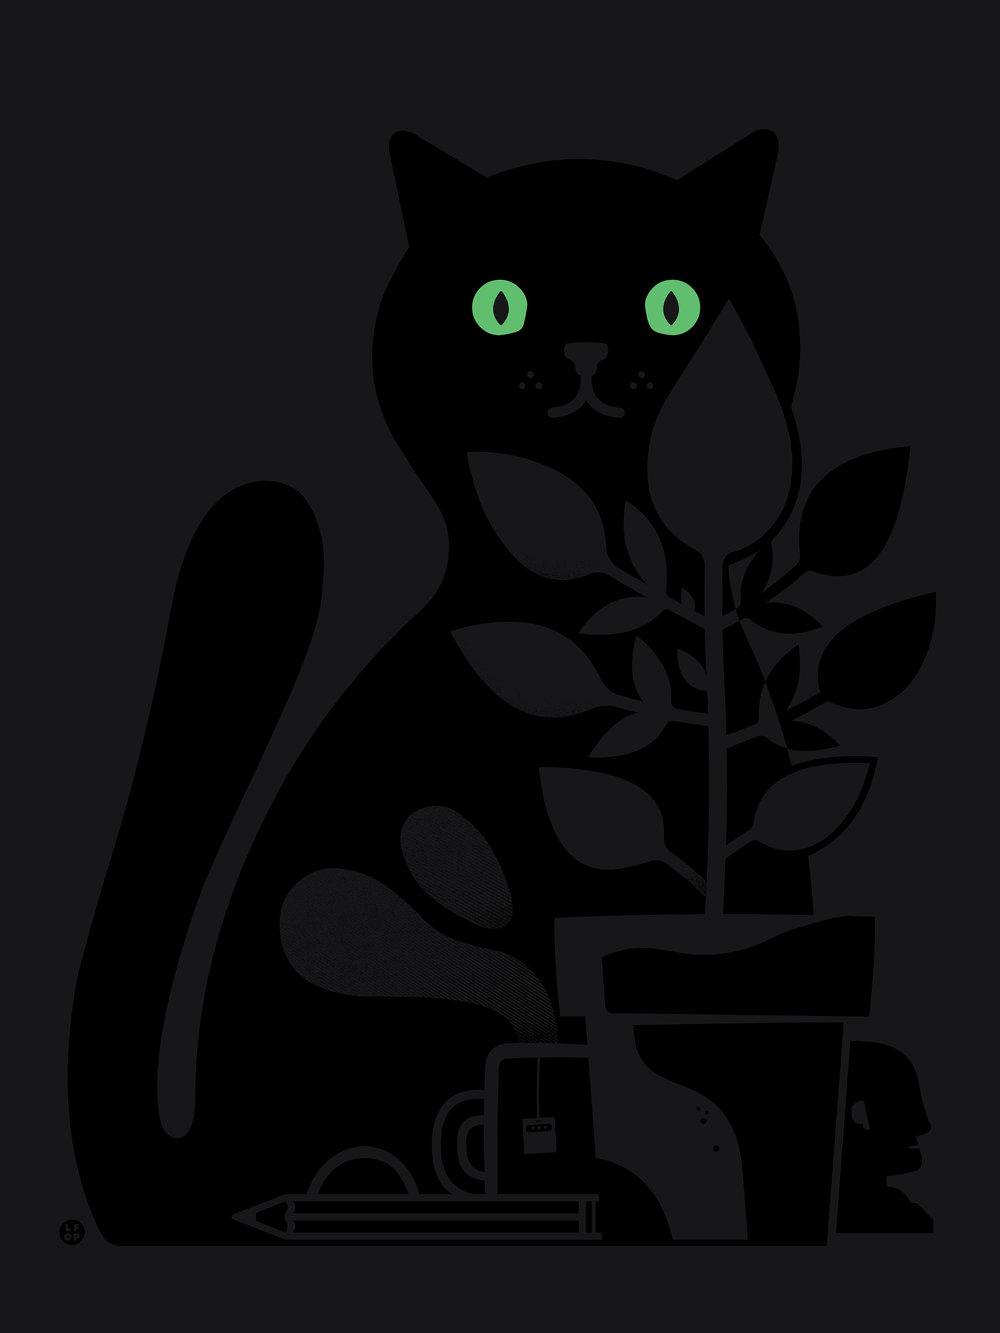 LFOP_MidnightCatPrint.jpg